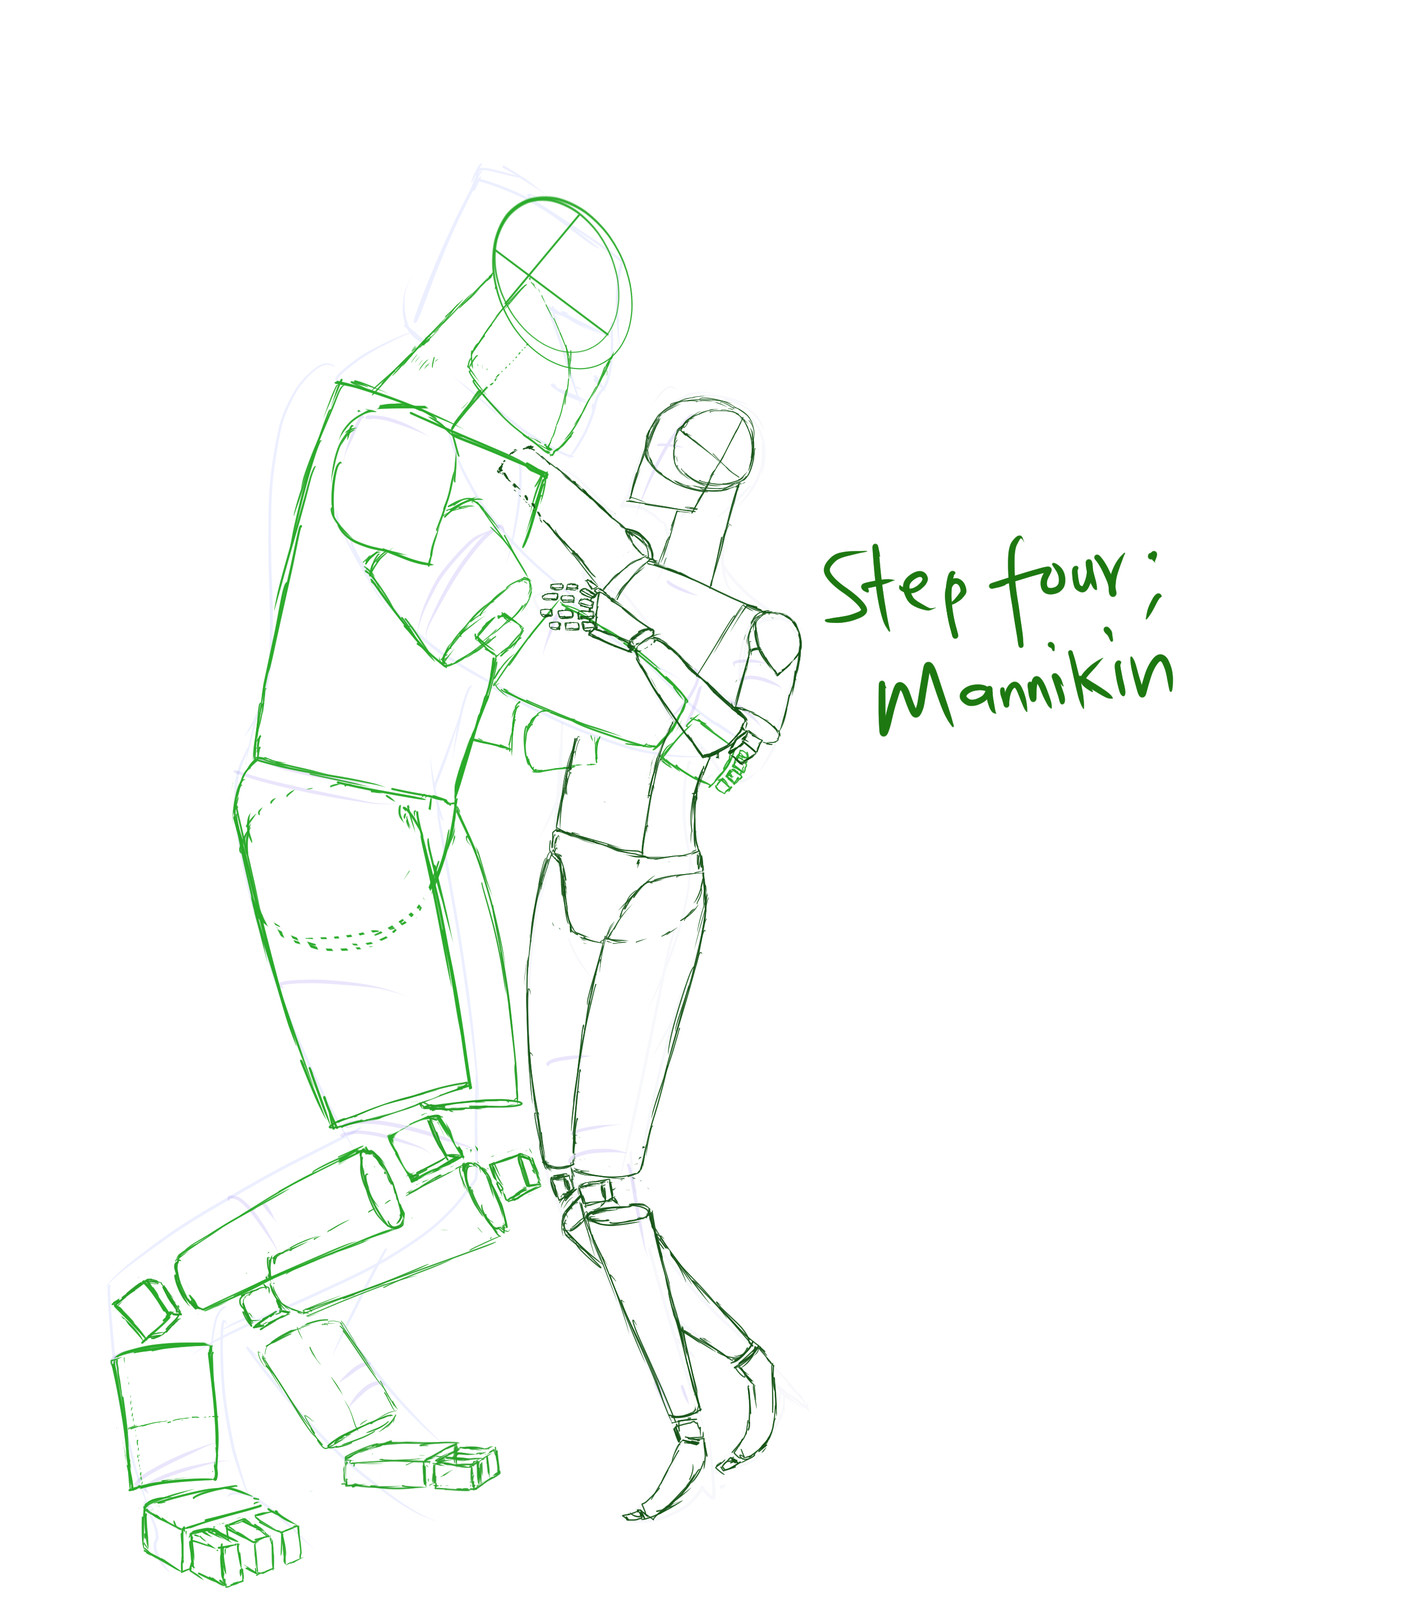 Step 4 of 7